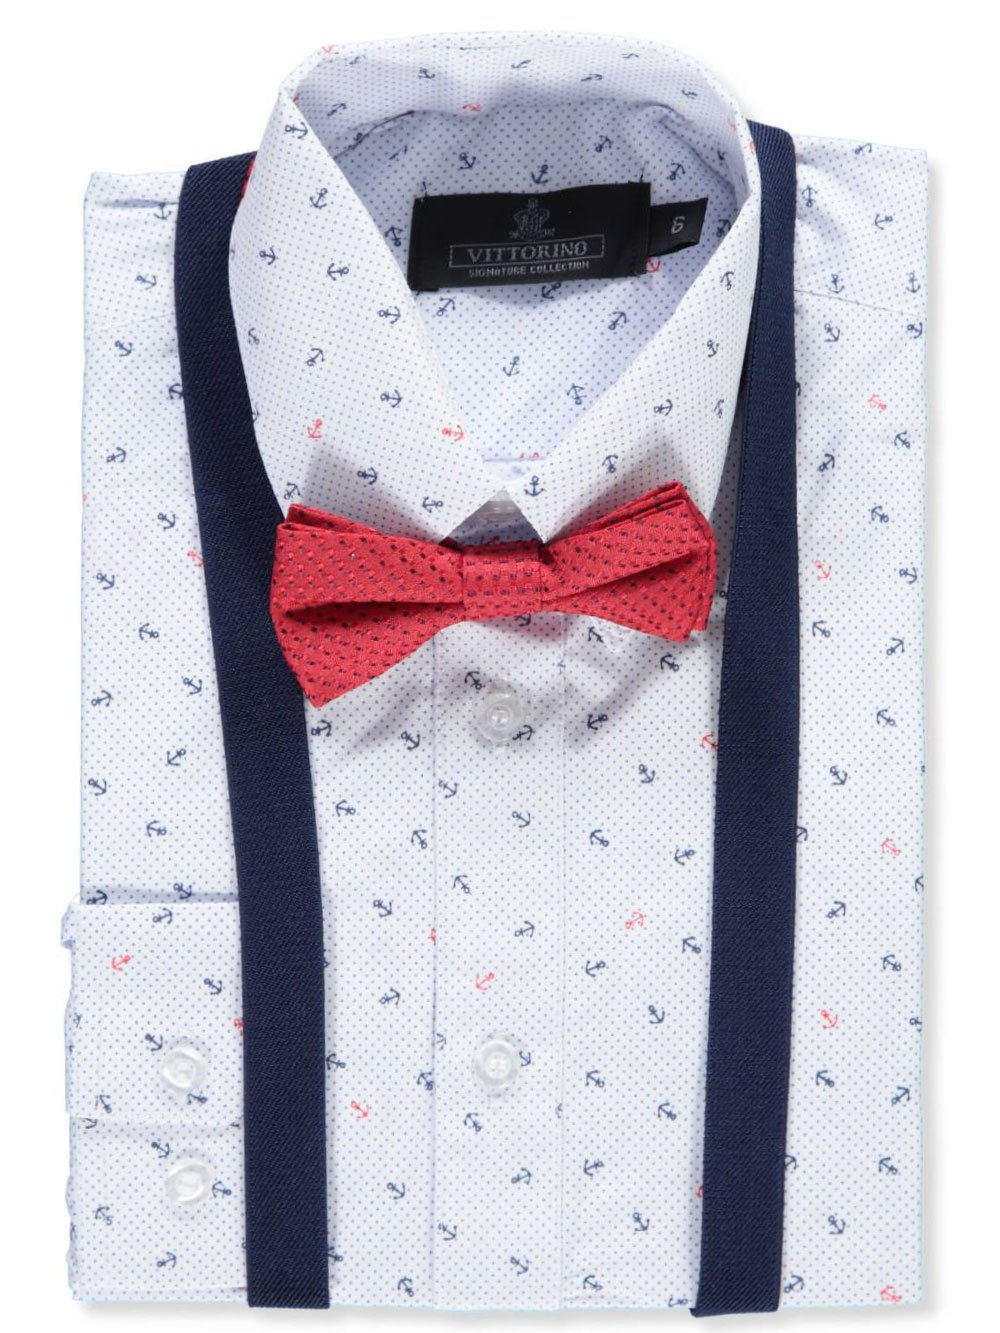 Vittorino Boys' Dress Shirt with Accessories